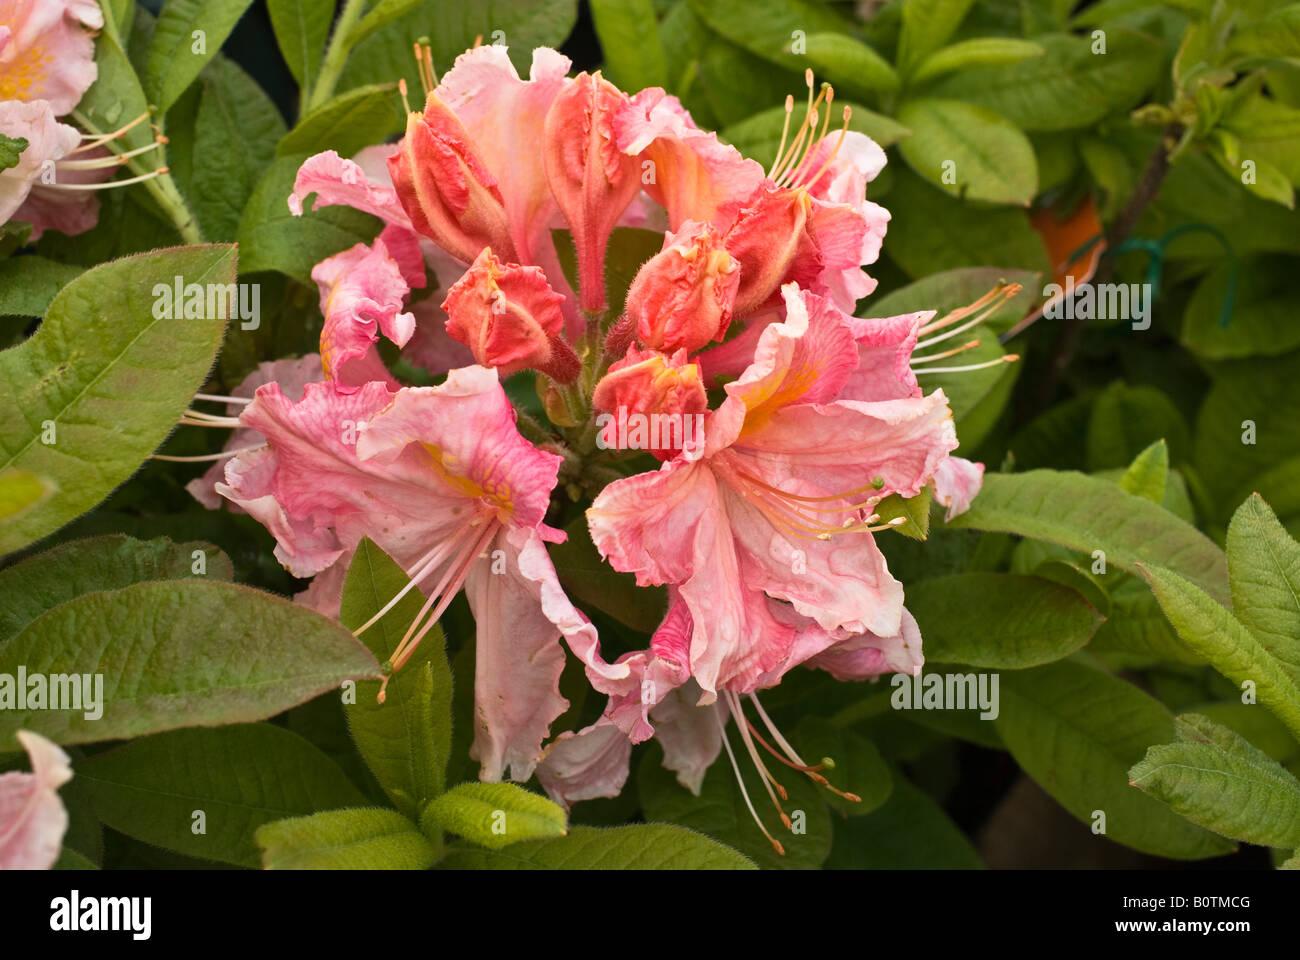 Azalea Strawberry Ice flower in May - Stock Image